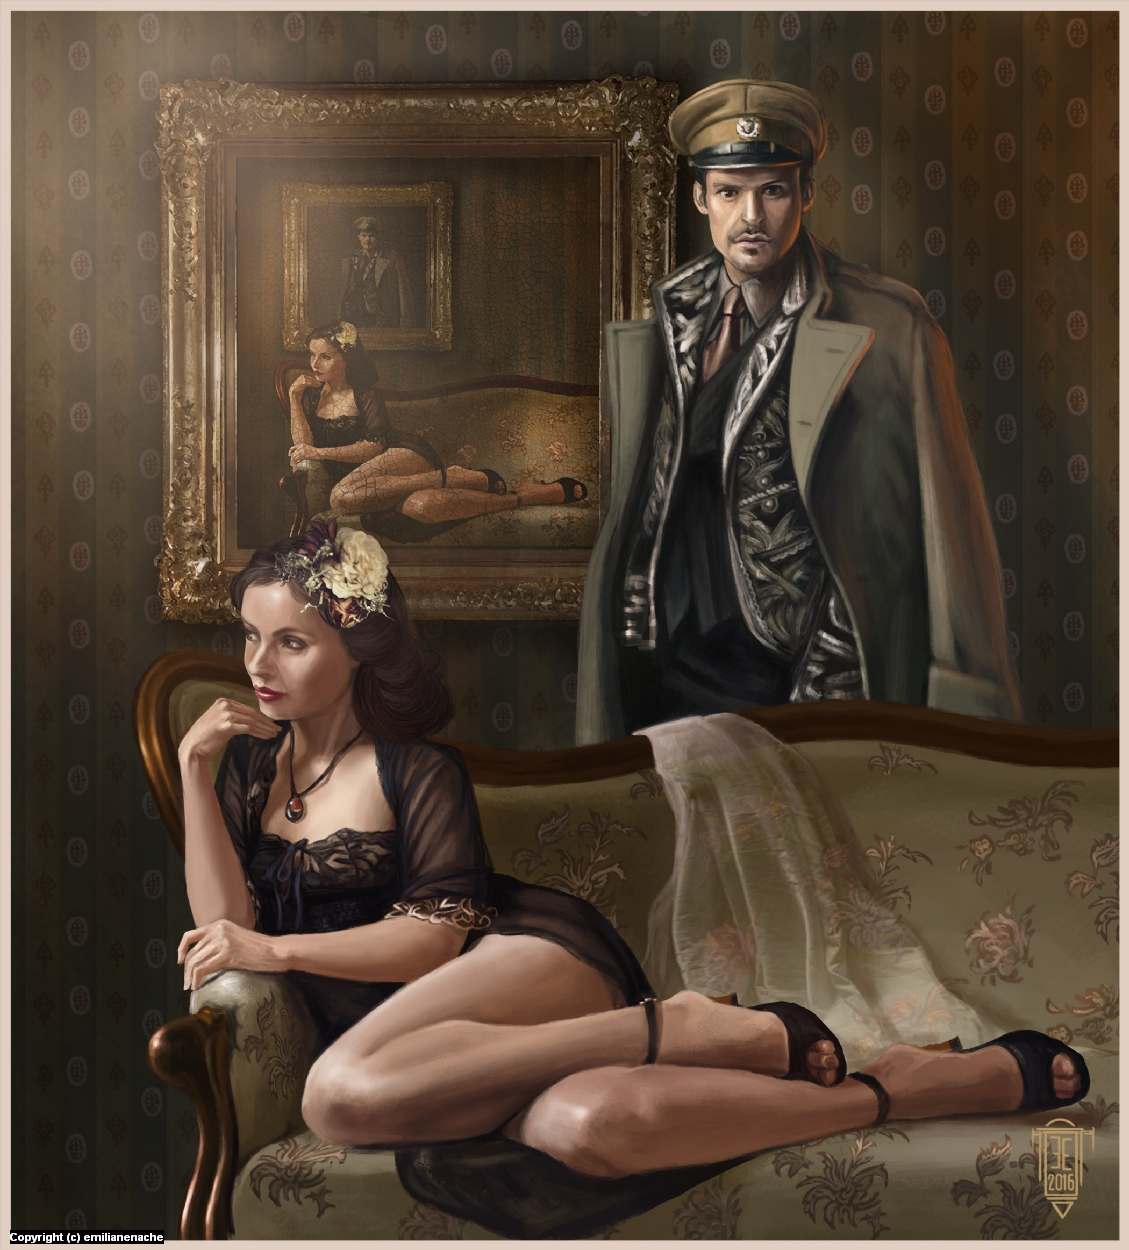 Memory of time  Artwork by Emilian Enache